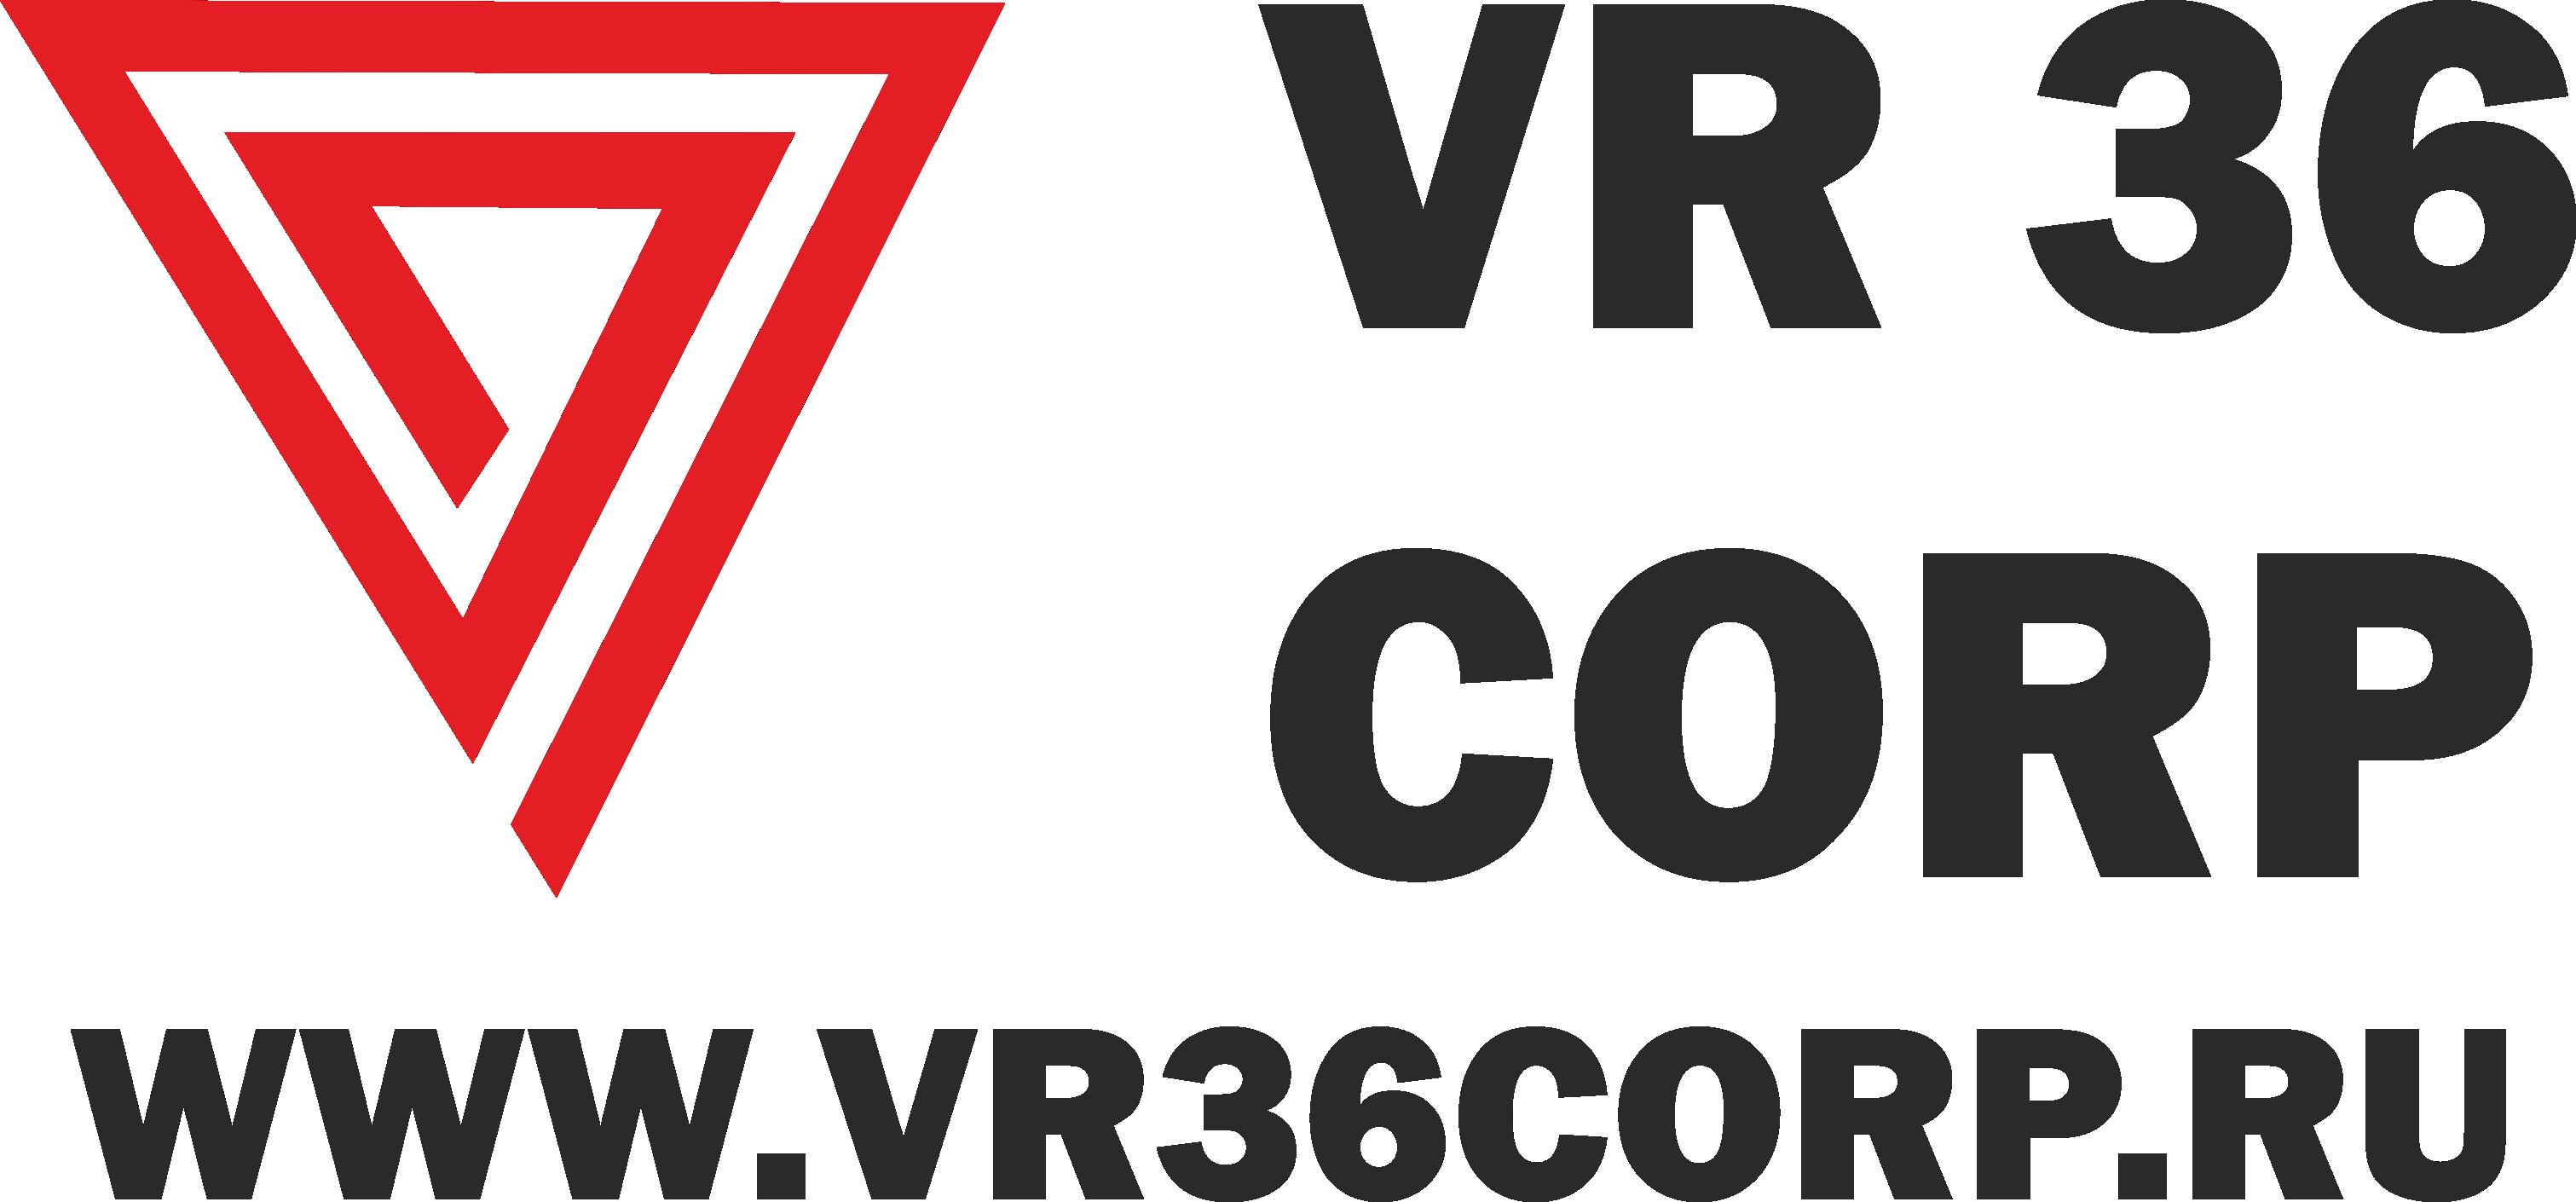 Центр виртуальной реальности - VR36Corp